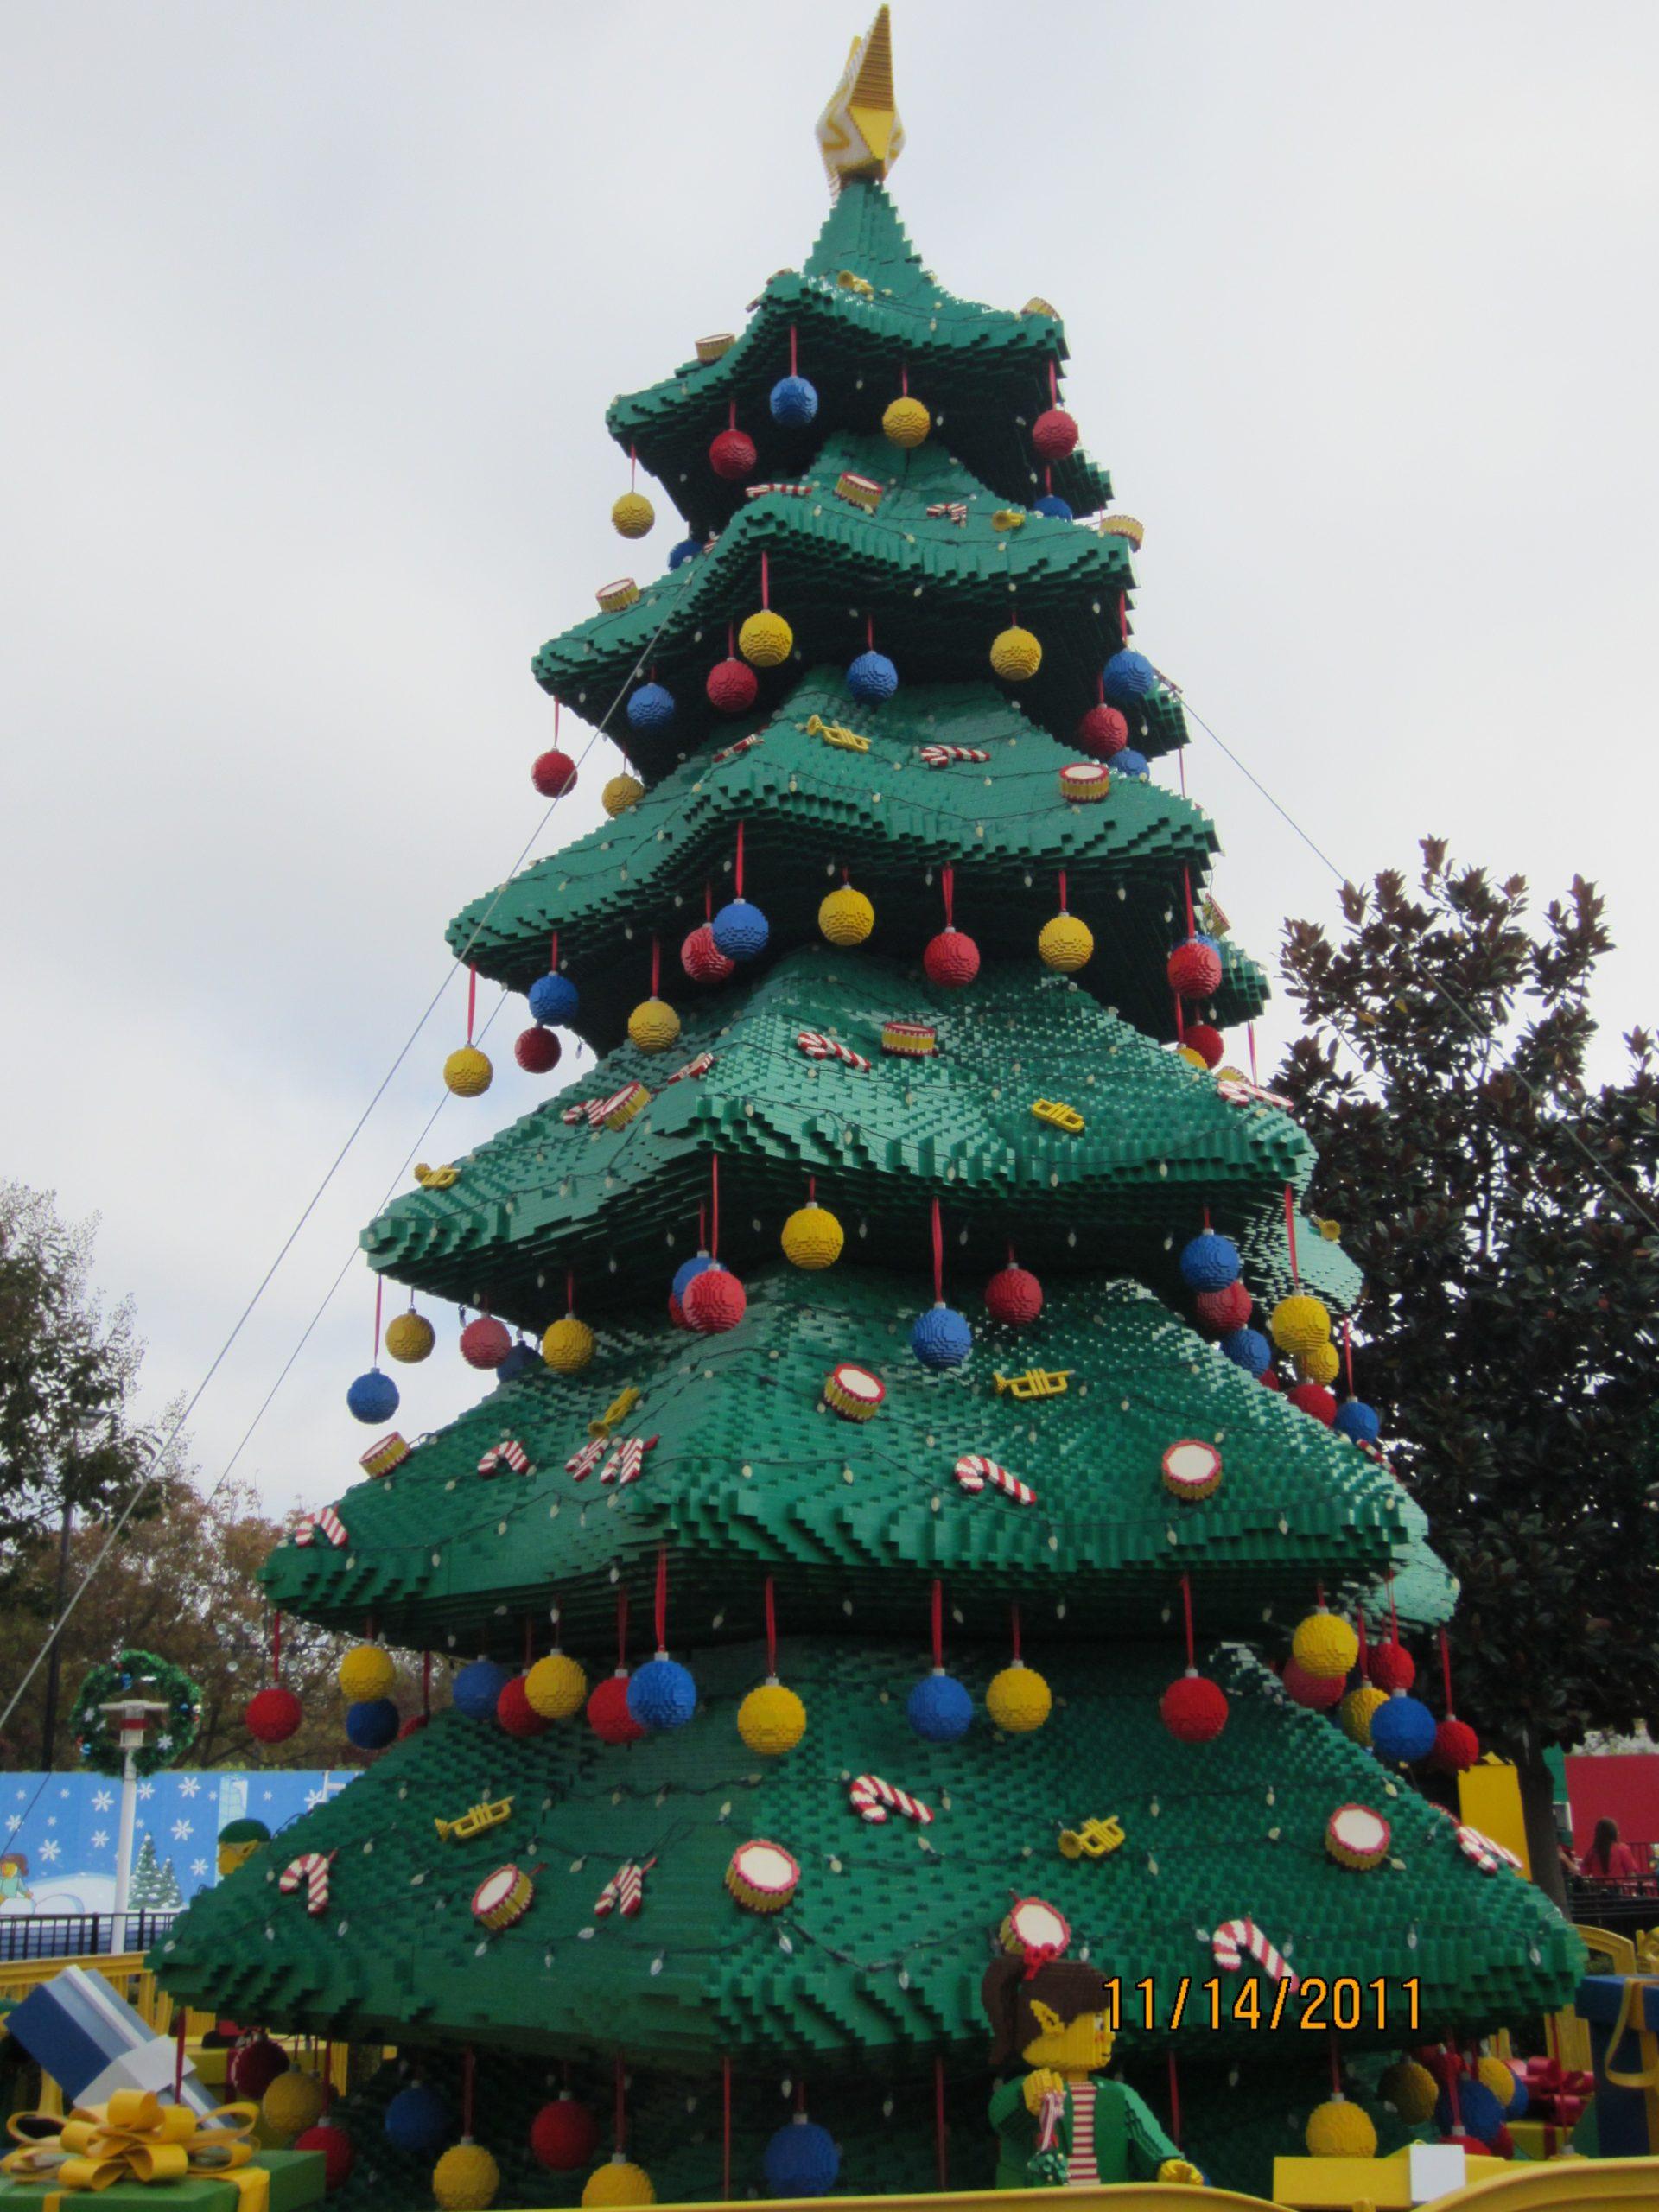 11-14-2011 Lego Christmas Tree « NutBugs